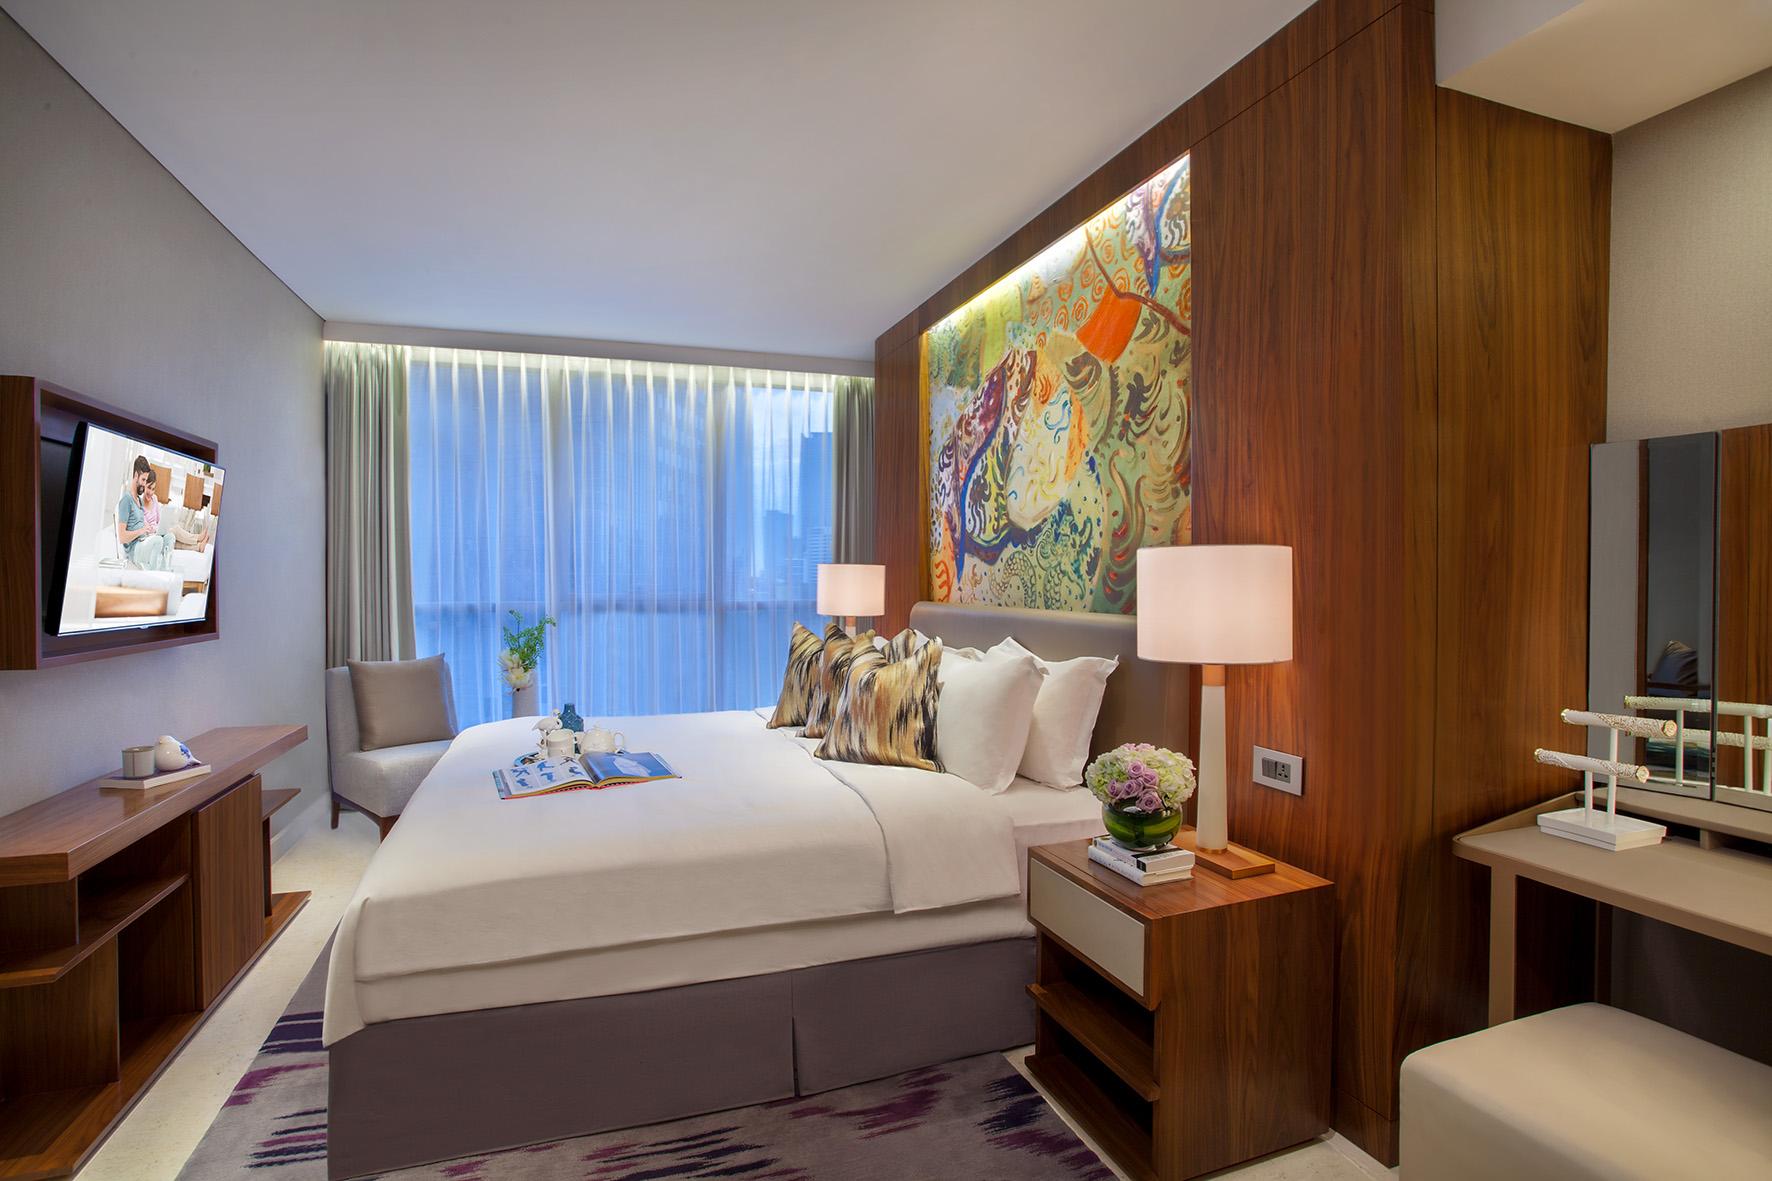 Bedroom at Ascott Sudirman Jakarta Apartments